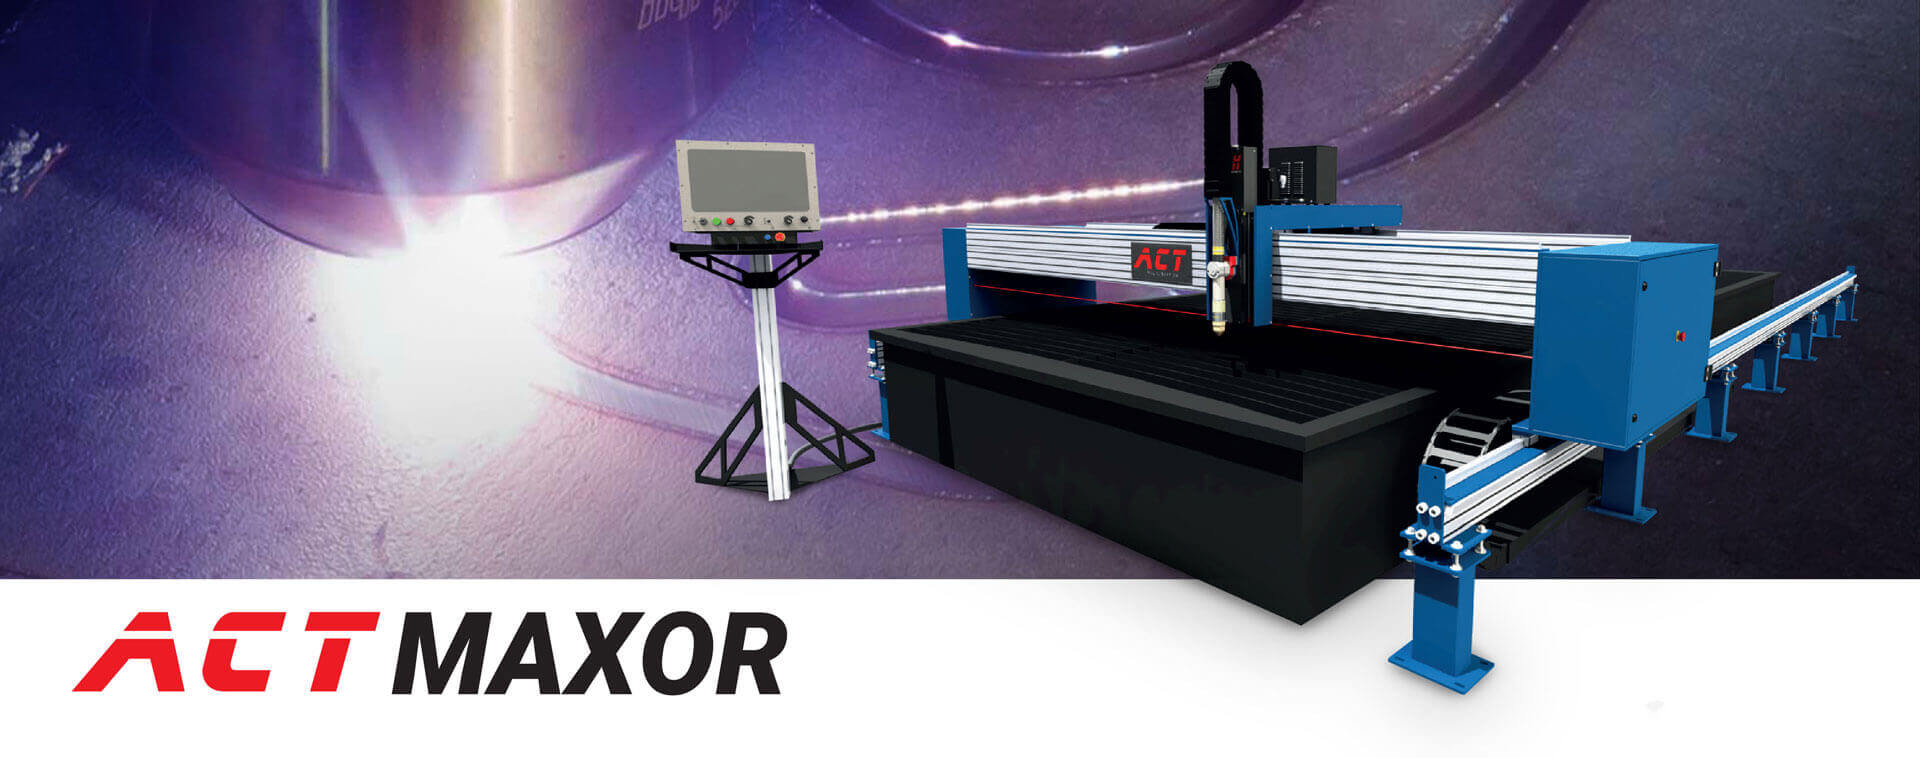 ACT Maxor cnc plasma cutter